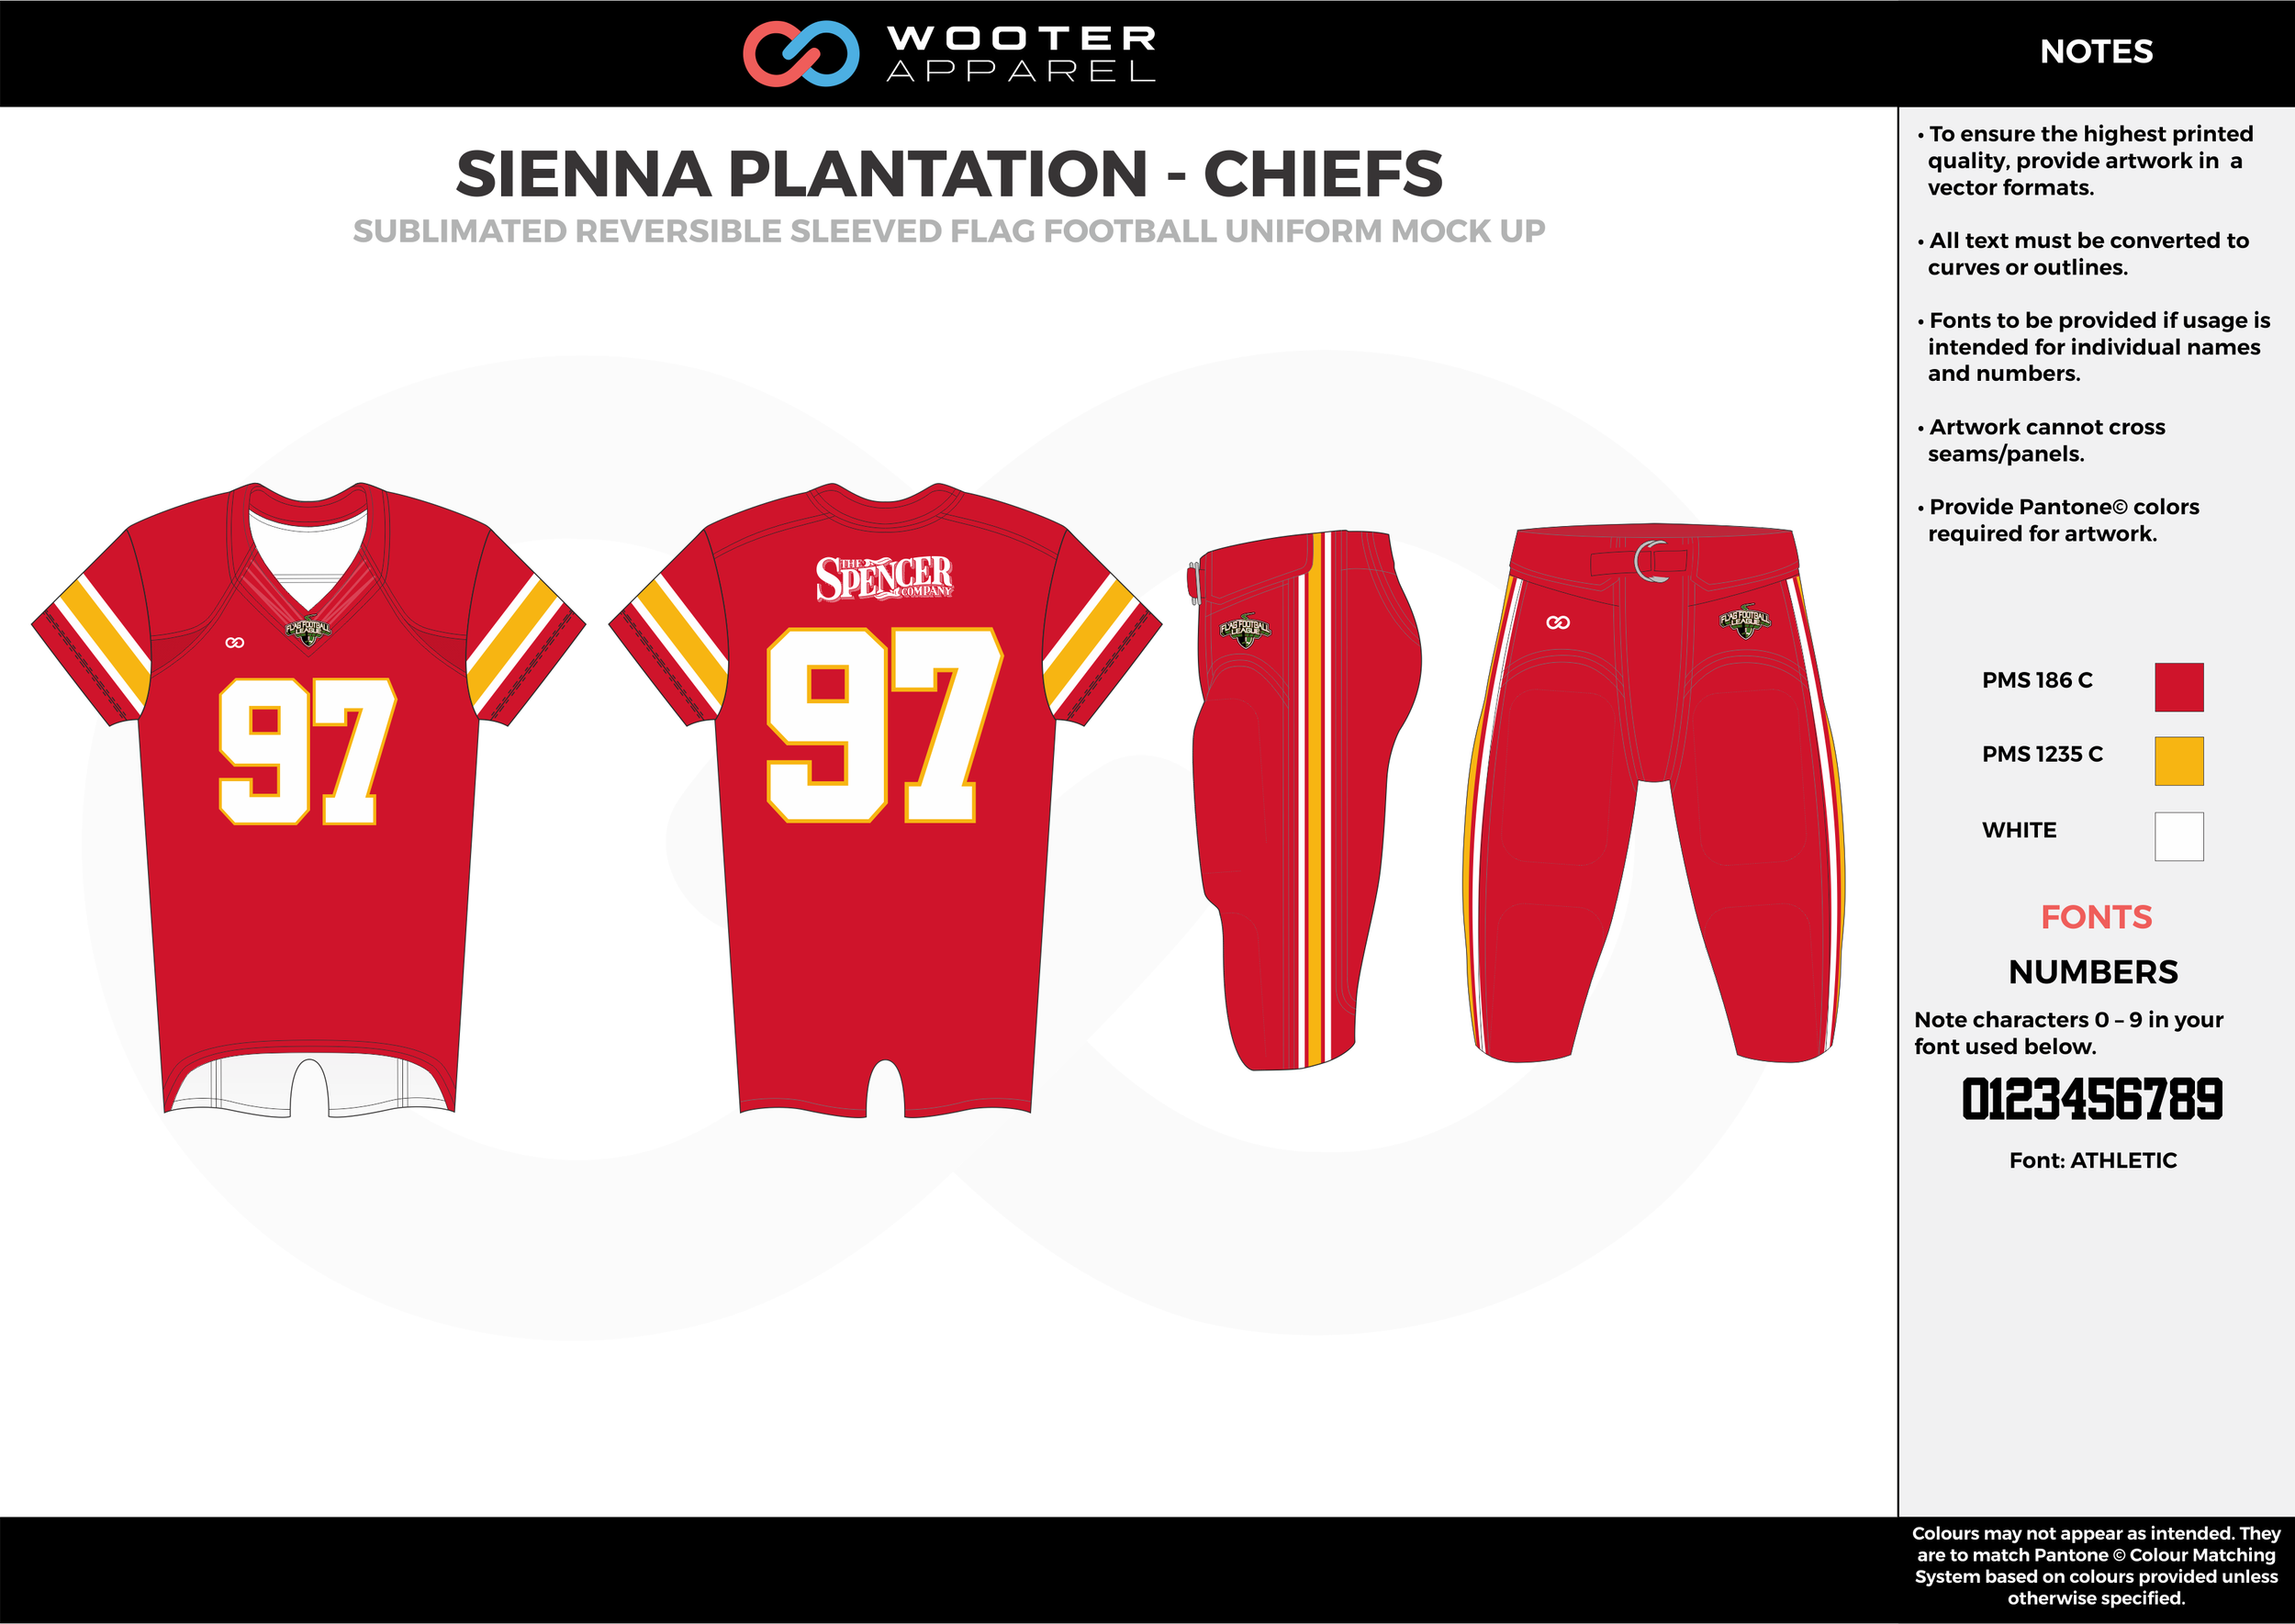 SIENNA PLANTATION - CHIEFS red orange white Football Uniform, Jersey, Pants, Integraded